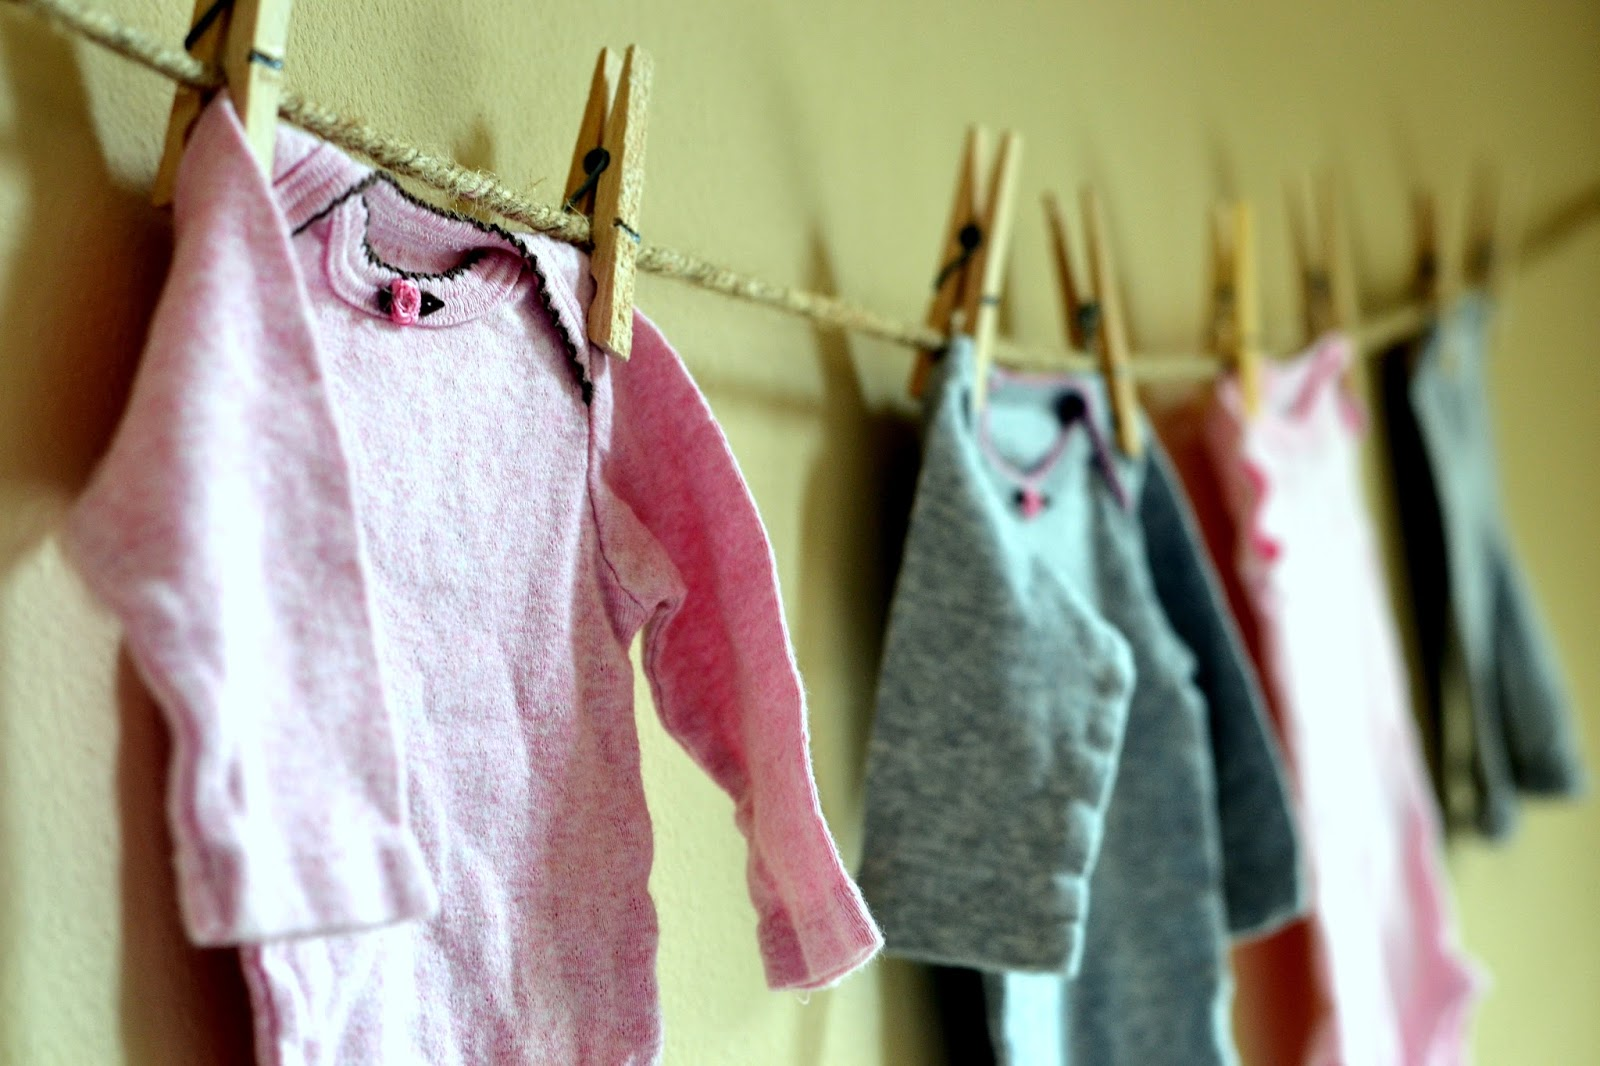 The Best Baby Laundry Tips Rachel Teodoro